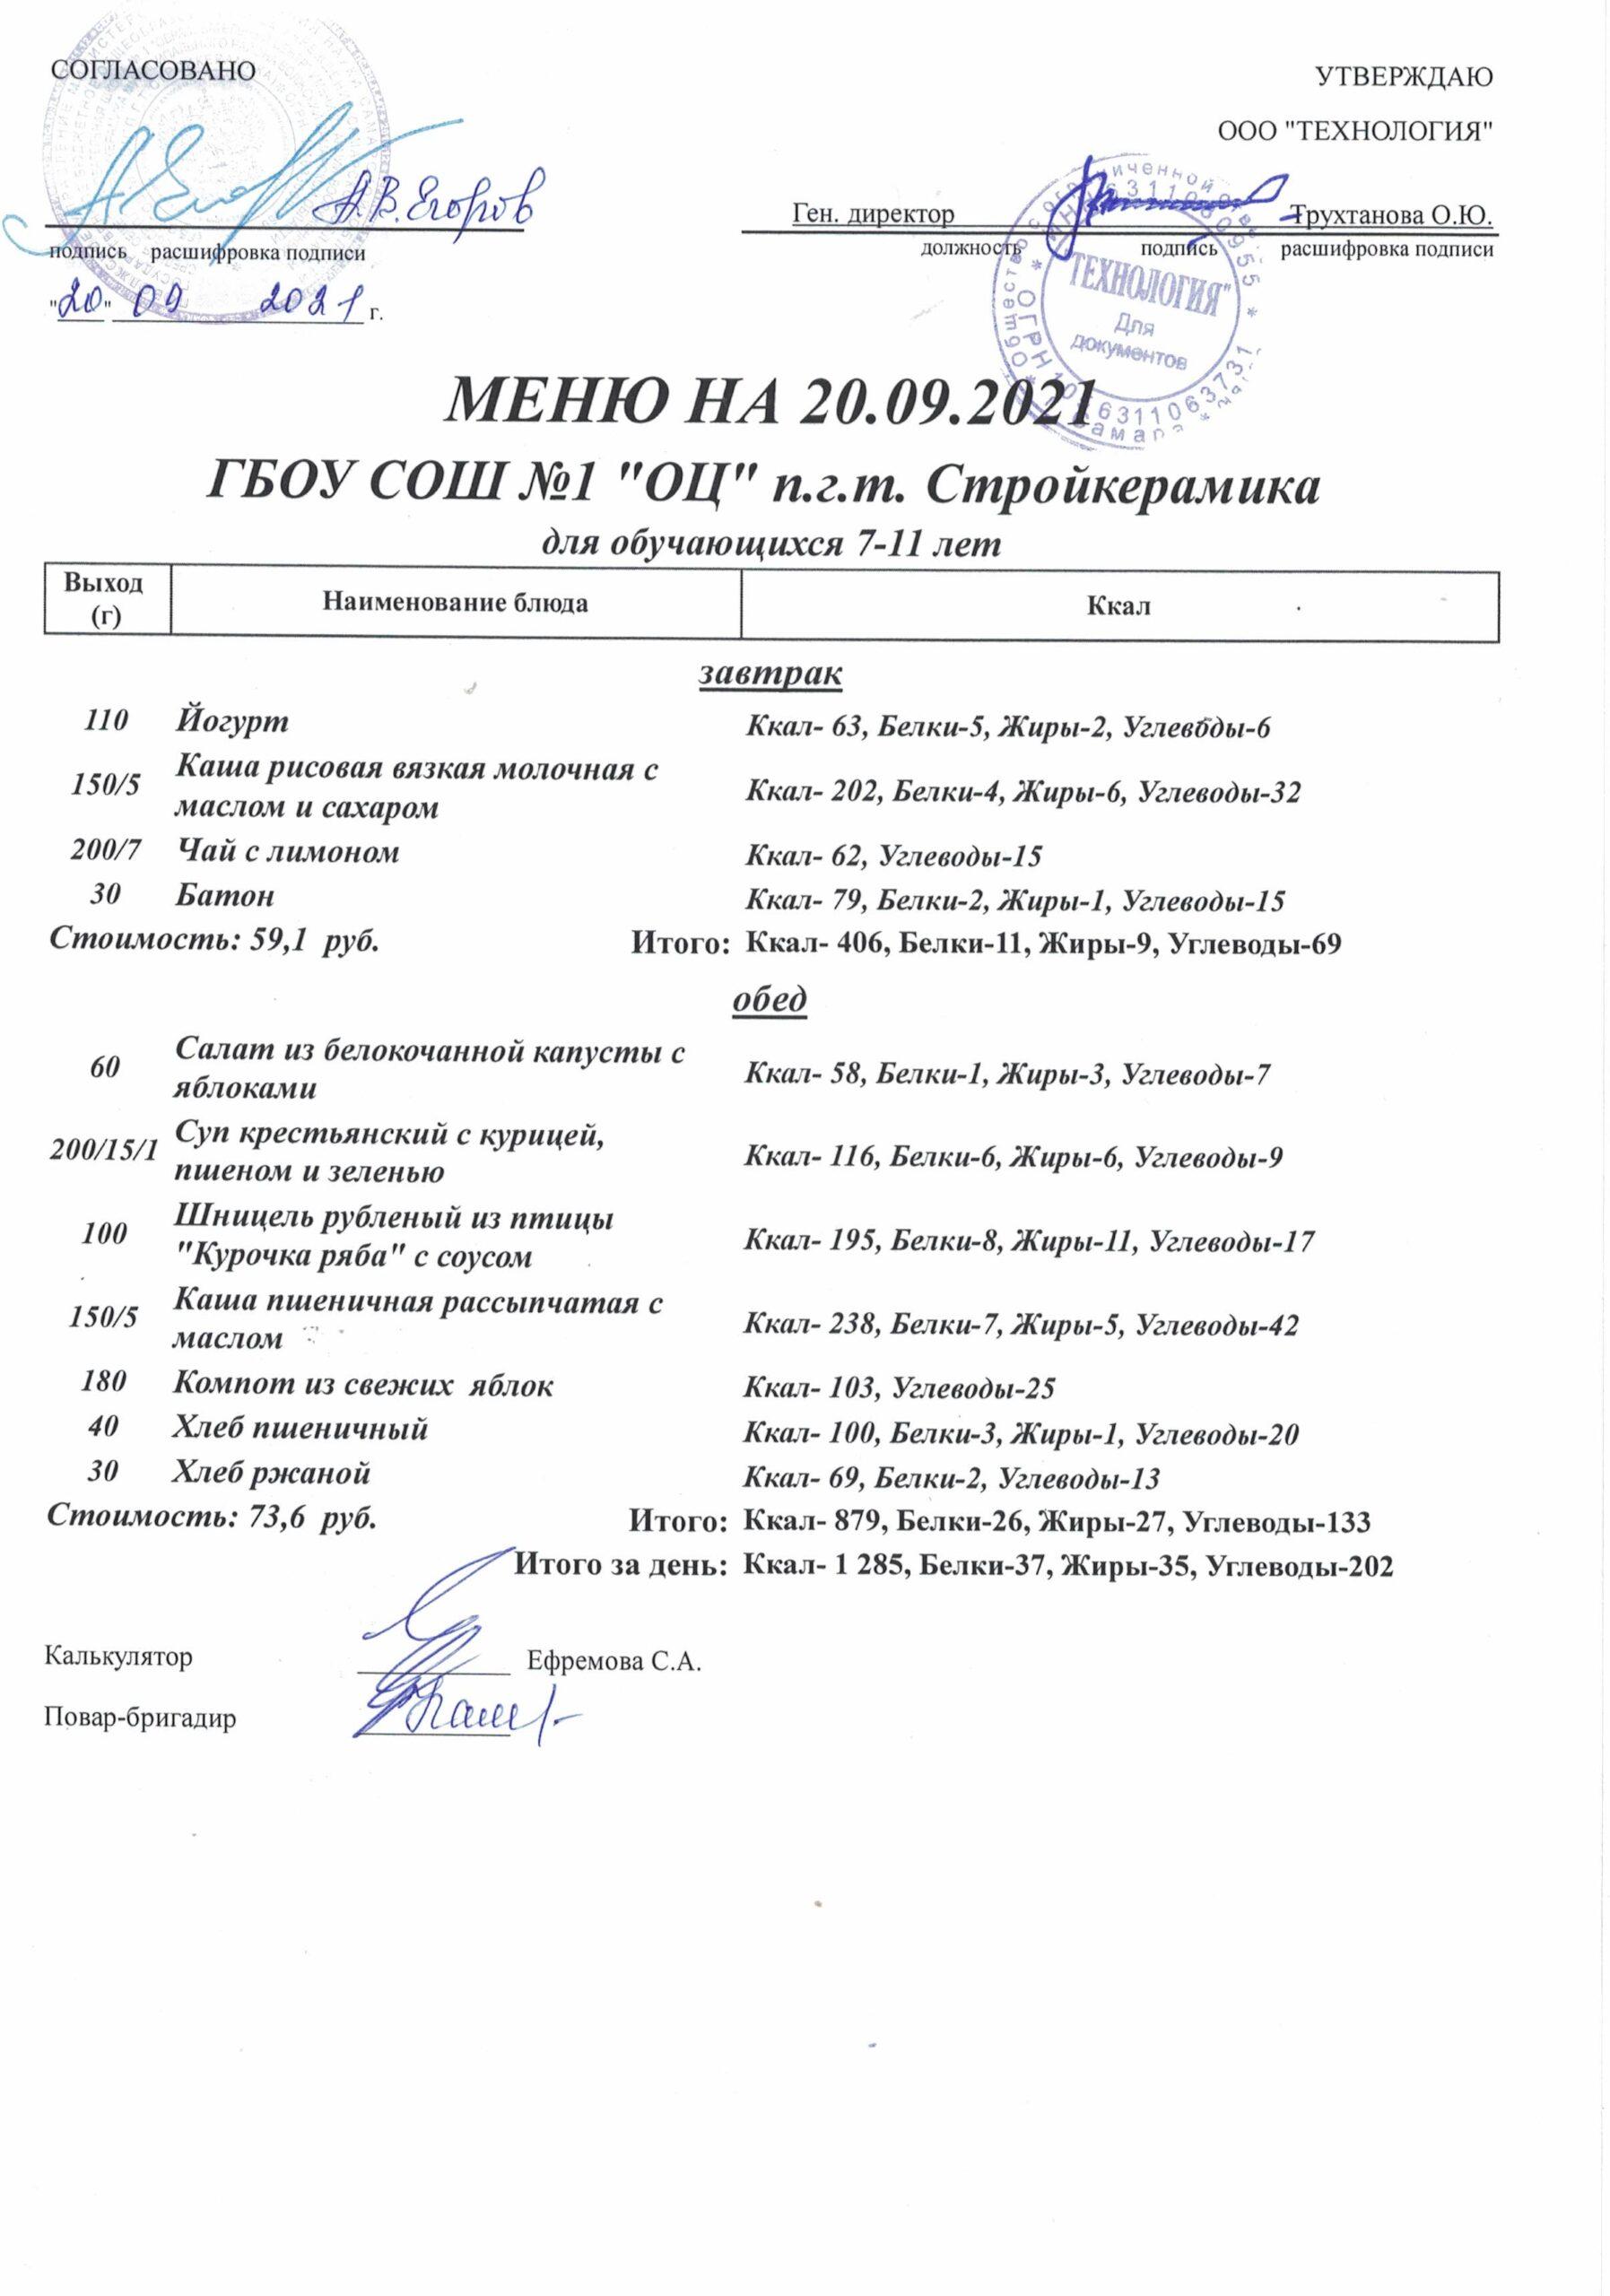 A9CE6298-F57F-4A13-BF17-AE01F8A25195